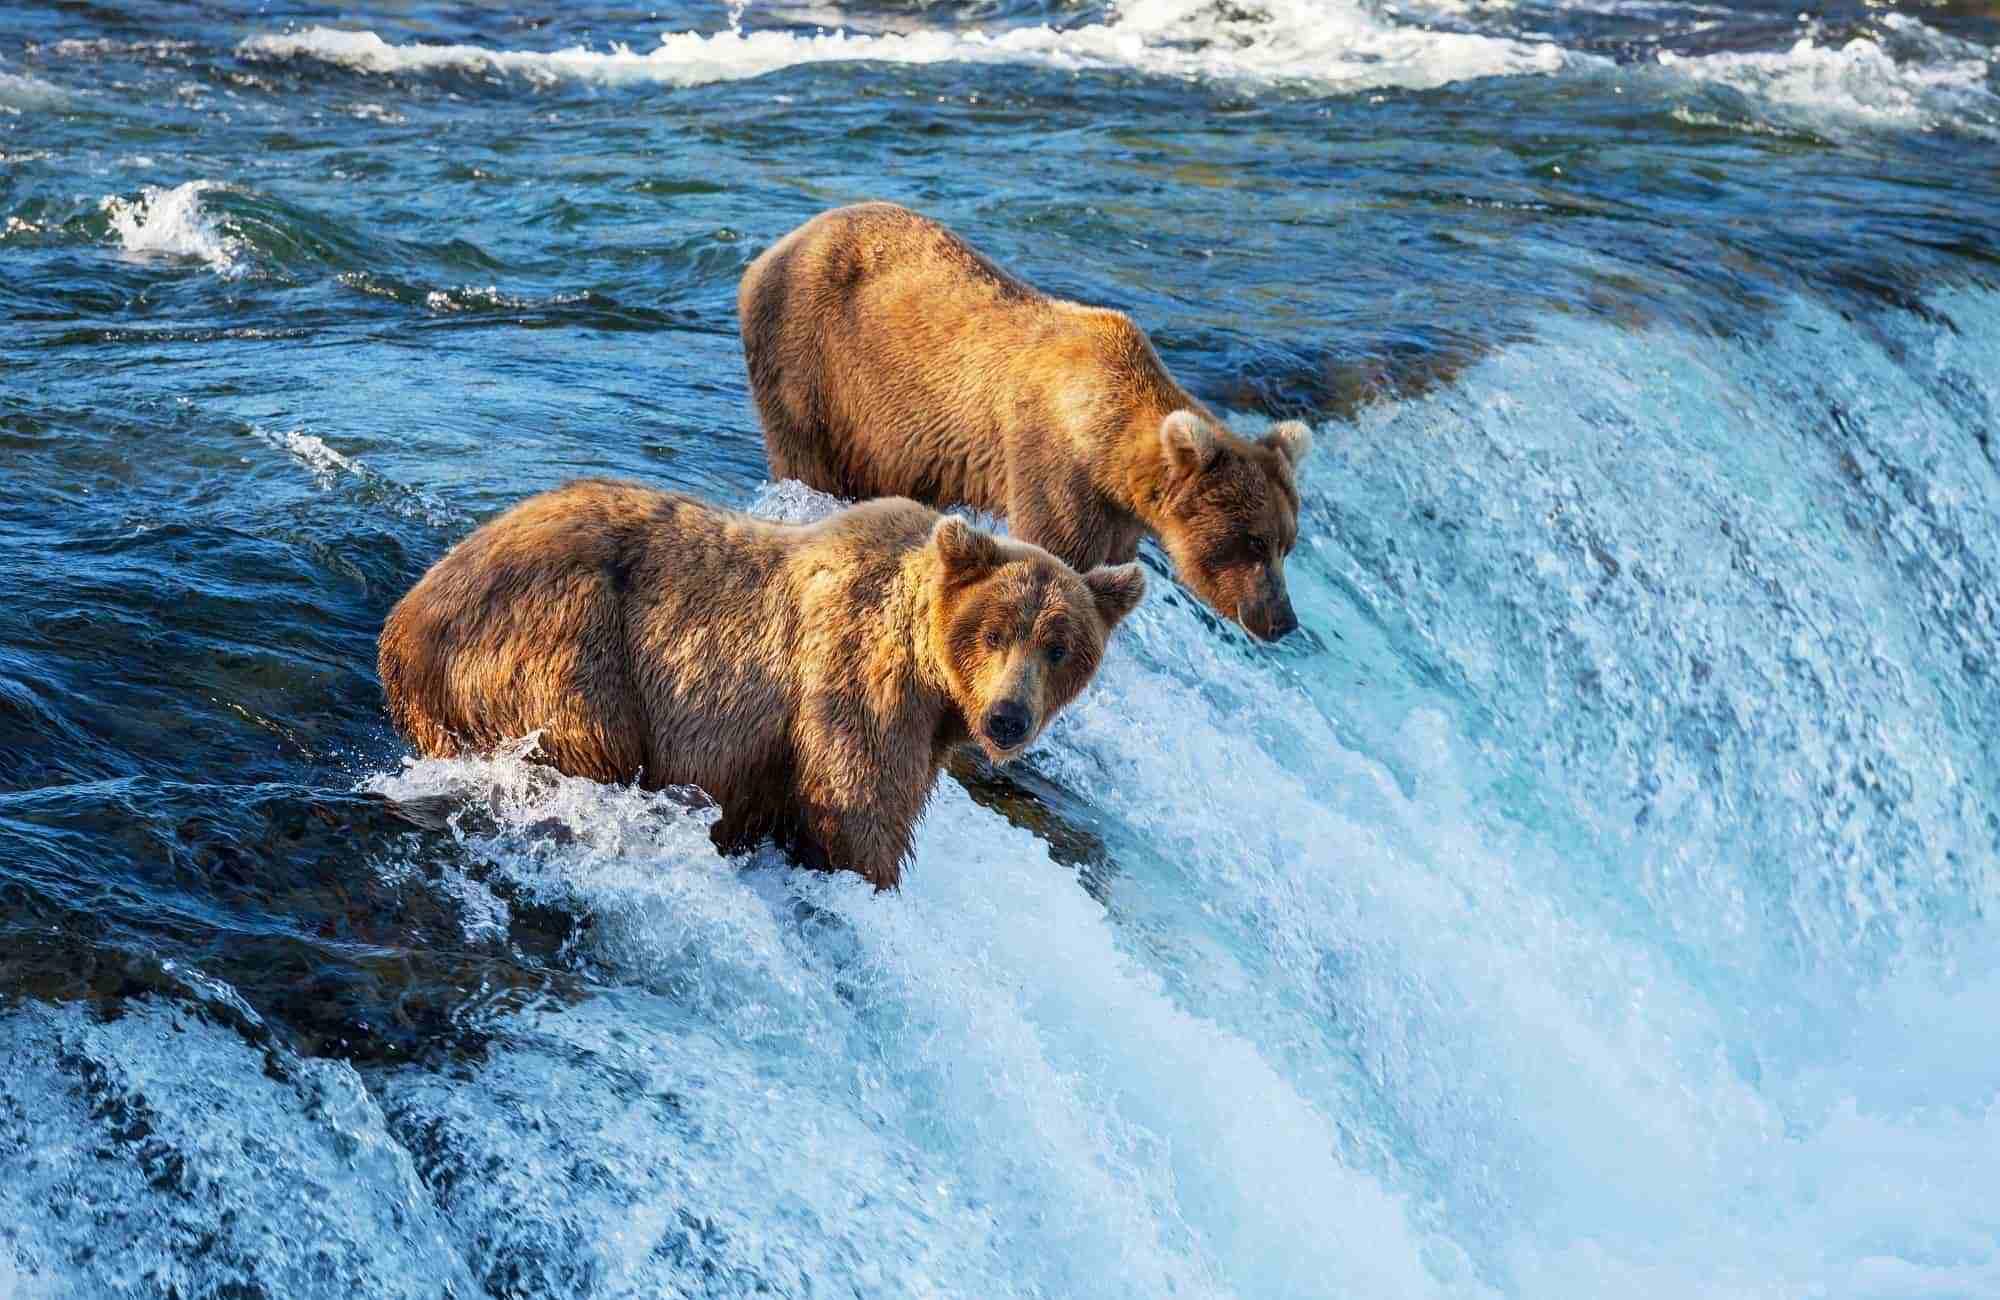 Voyage Etats-Unis - Alaska - Ours brun - Amplitudes